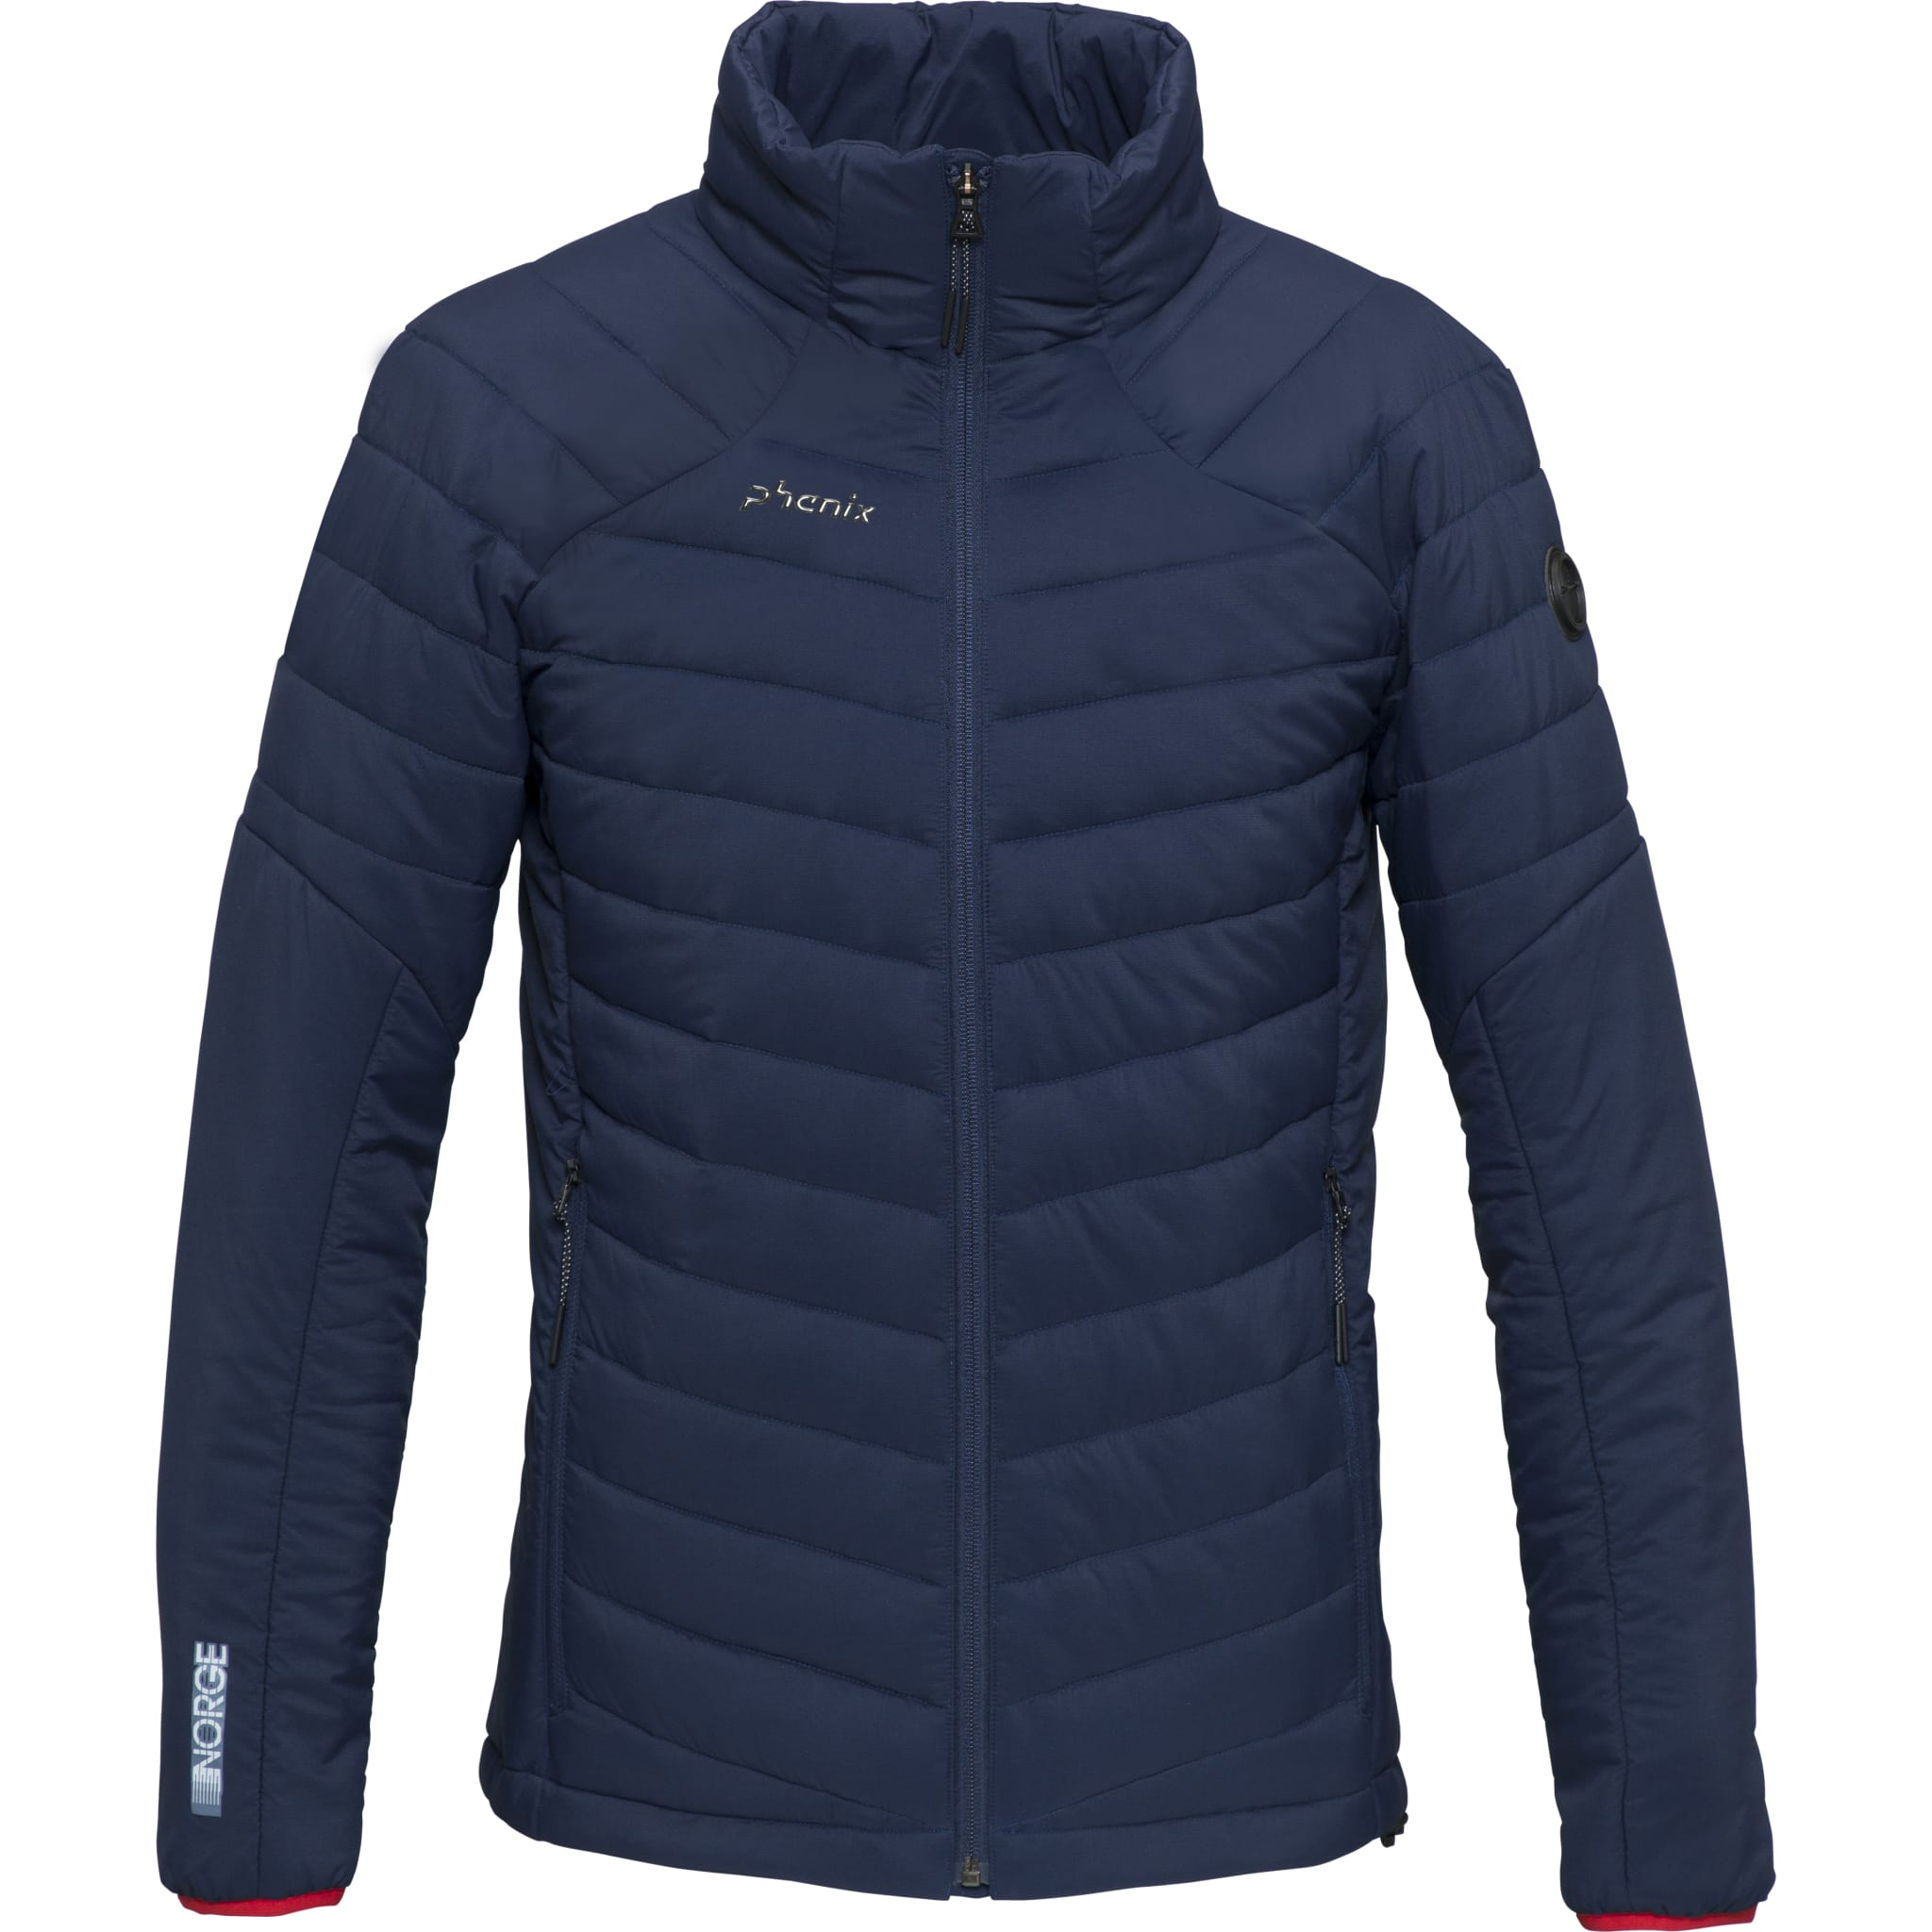 Norway Alpine Team Insulated Jacket